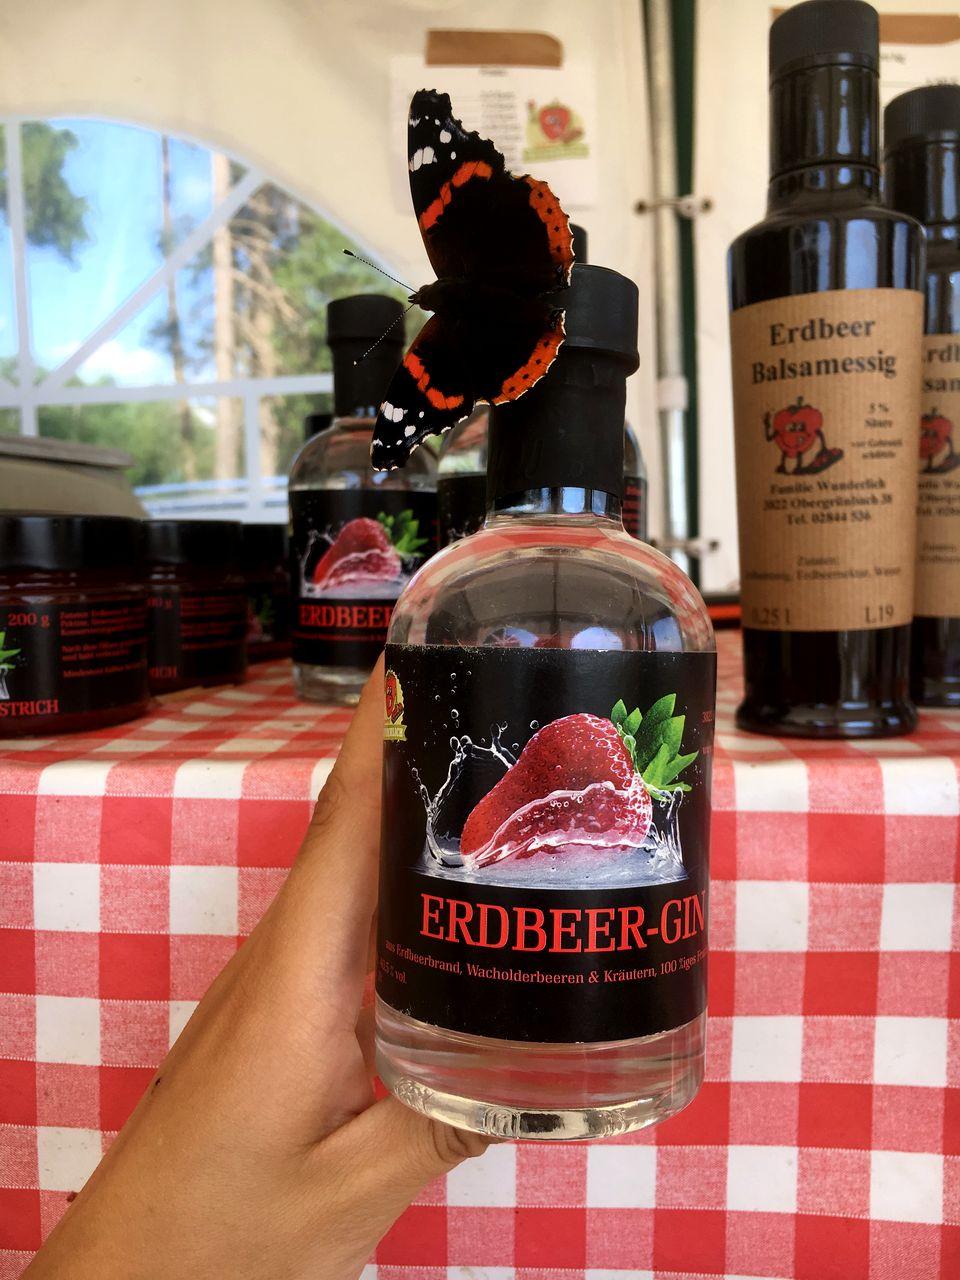 Erdbeerhof Wunderlich – seltener Erdbeer-Gin